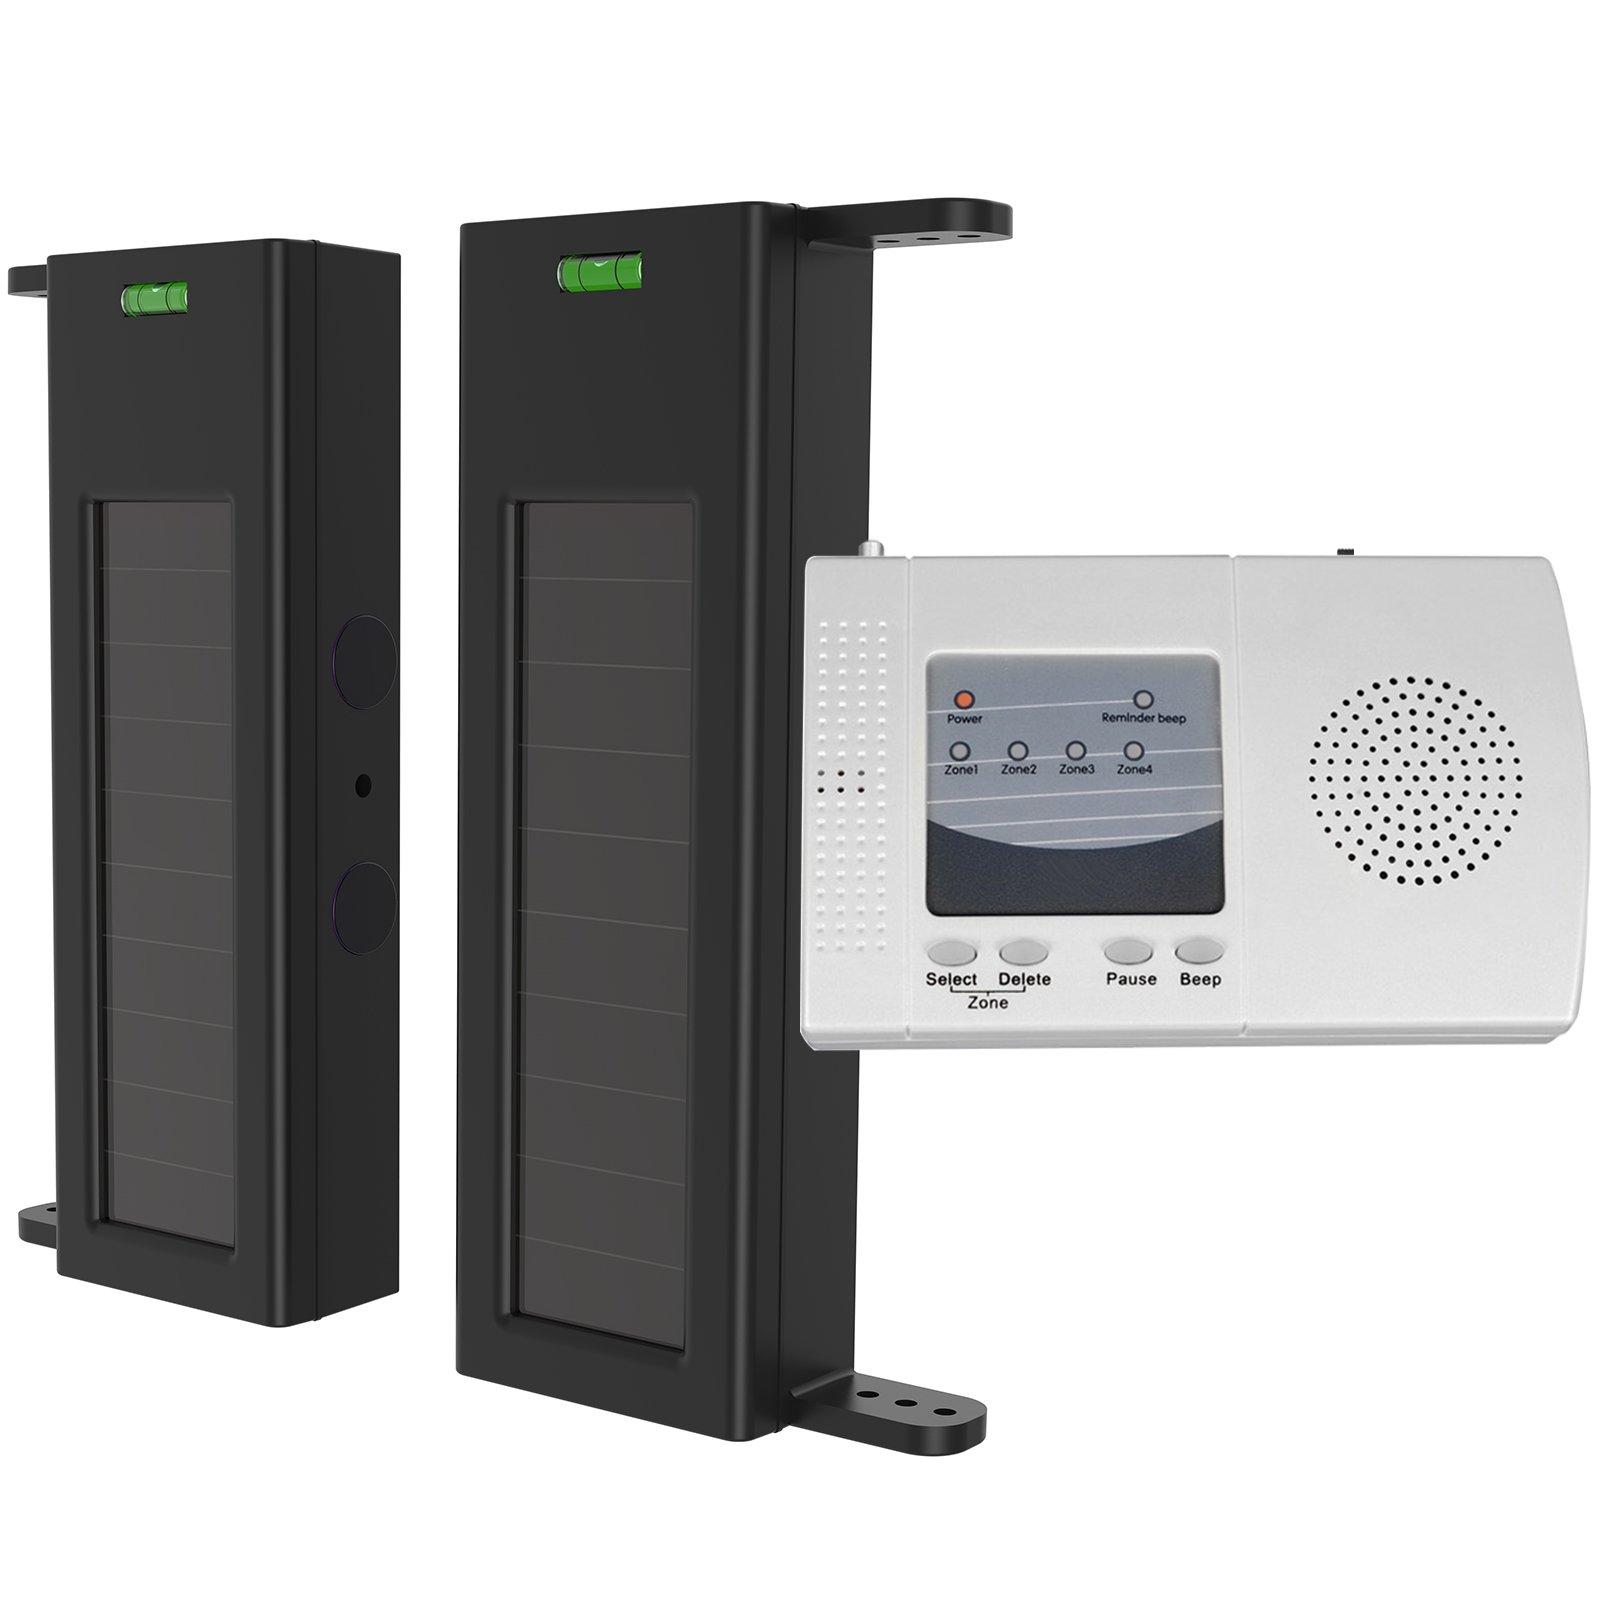 HTZSAFE Solar Wireless Driveway Alarm-190 Feet Wide Sensor Range 1/4 Mile Long Range,Outdoor Weatherproof Sensor & Detector No Wiring No Need Replace Battery,Perimeter Alarm System Driveway Alert Kit